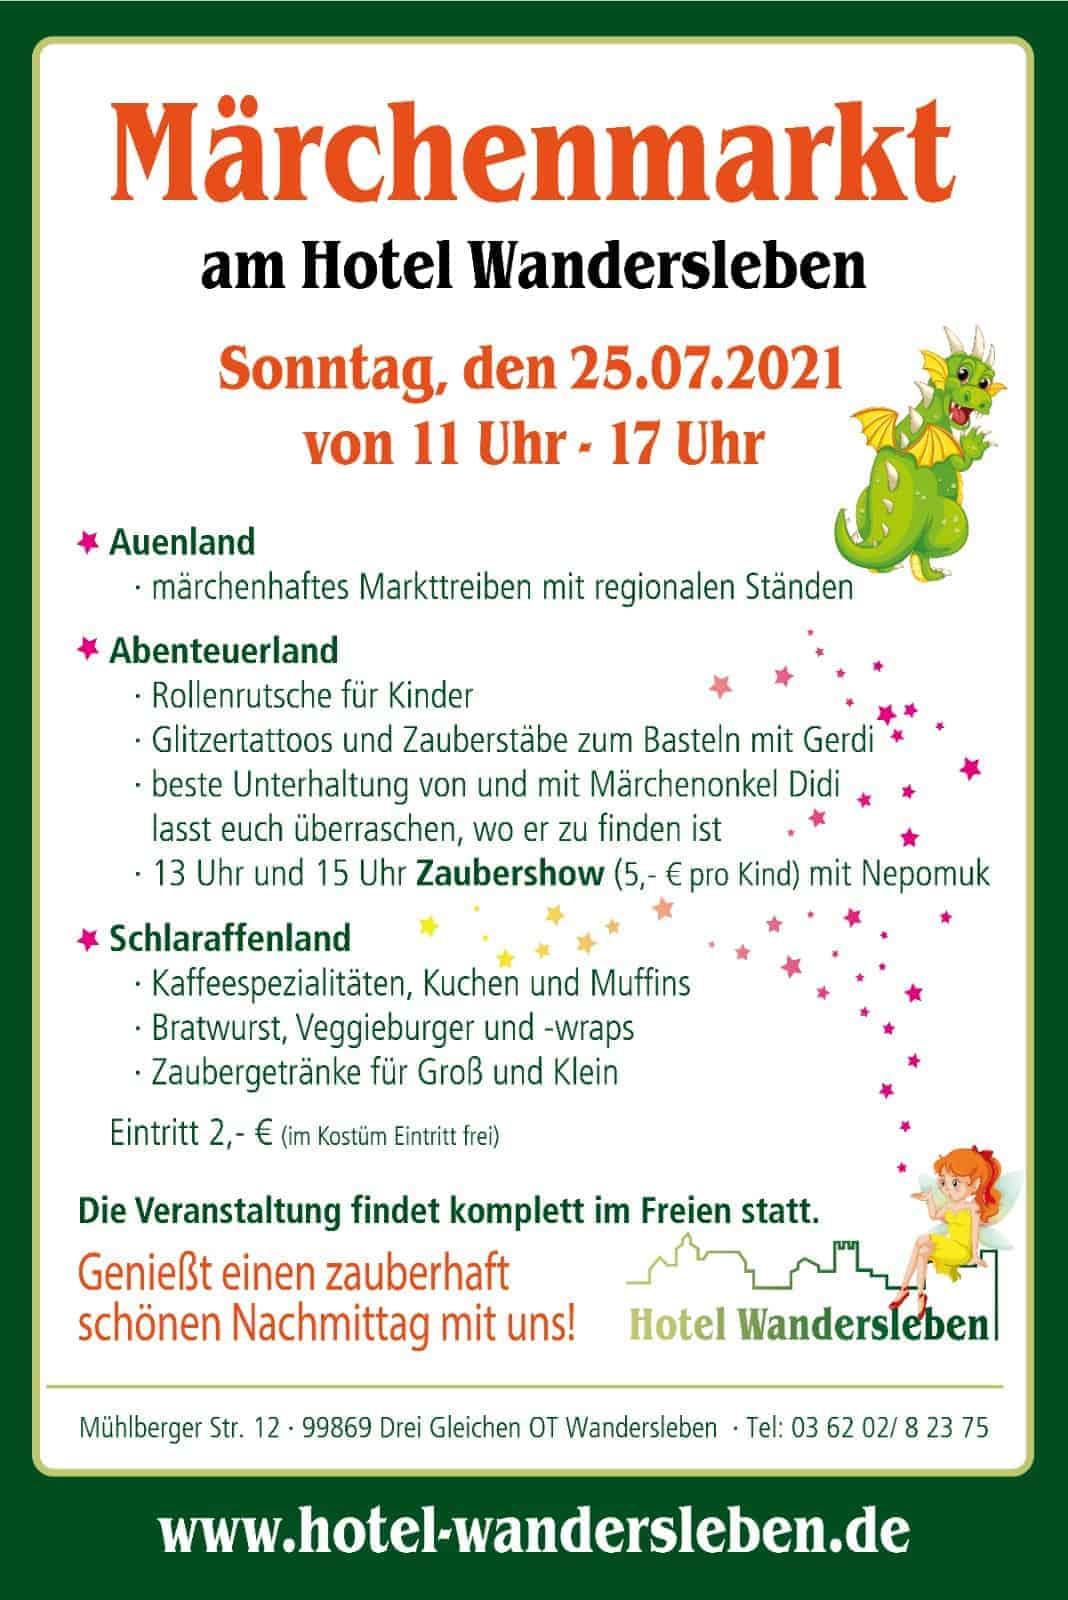 Märchenmarkt Hotel Wandersleben